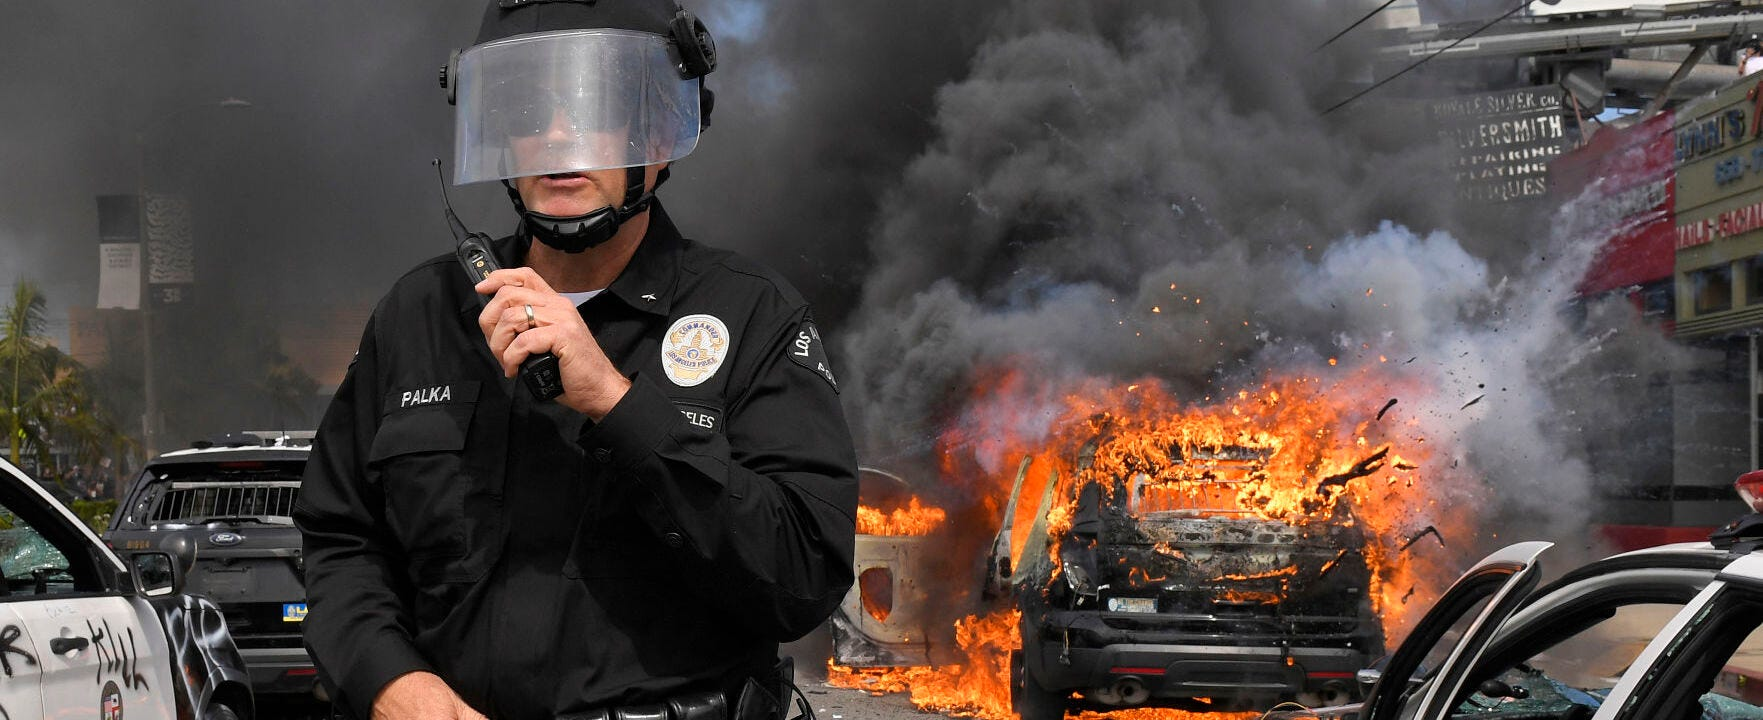 Do the riots shake your faith in civil society?